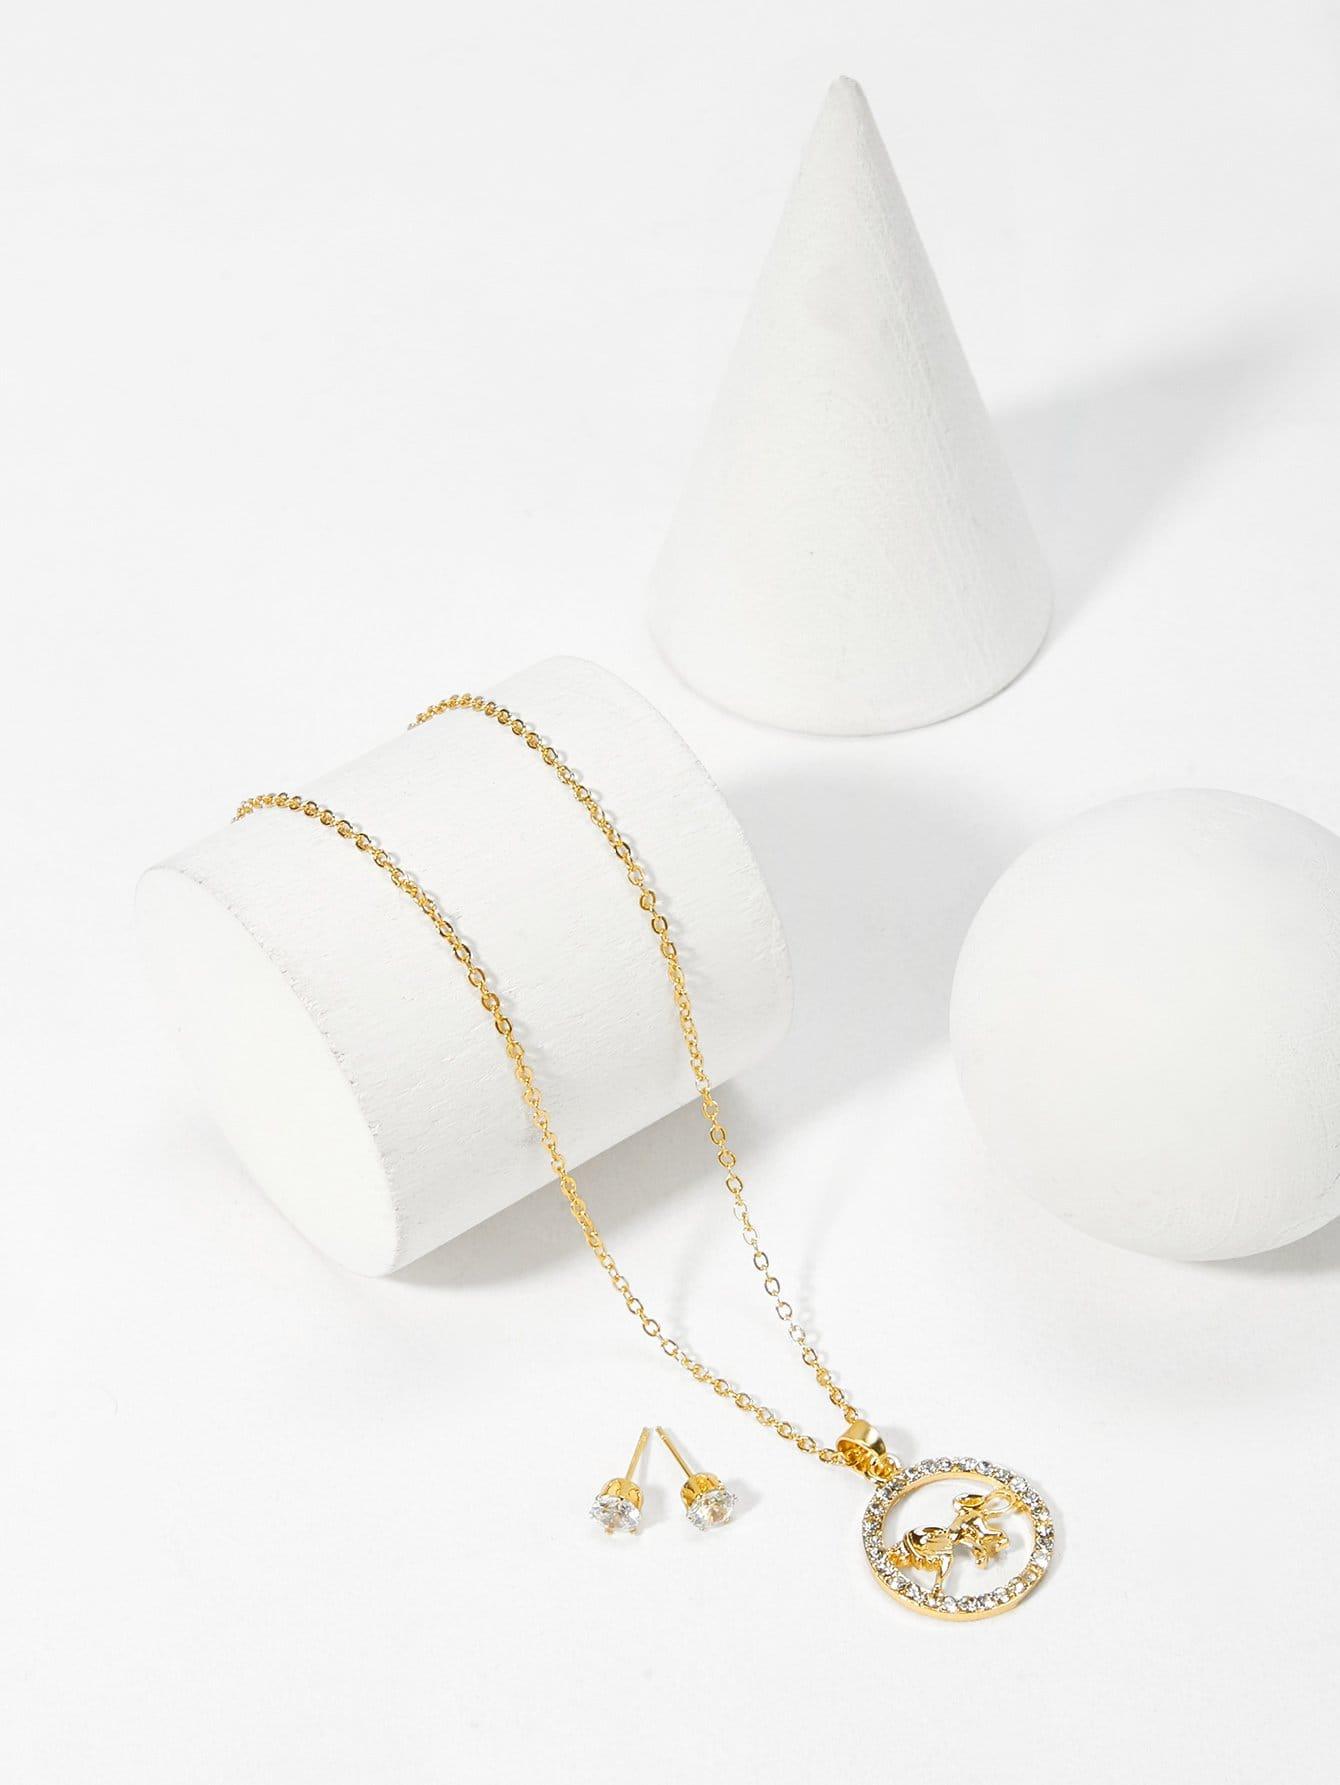 Strass Kreis Anhänger Halskette & Ohrringe